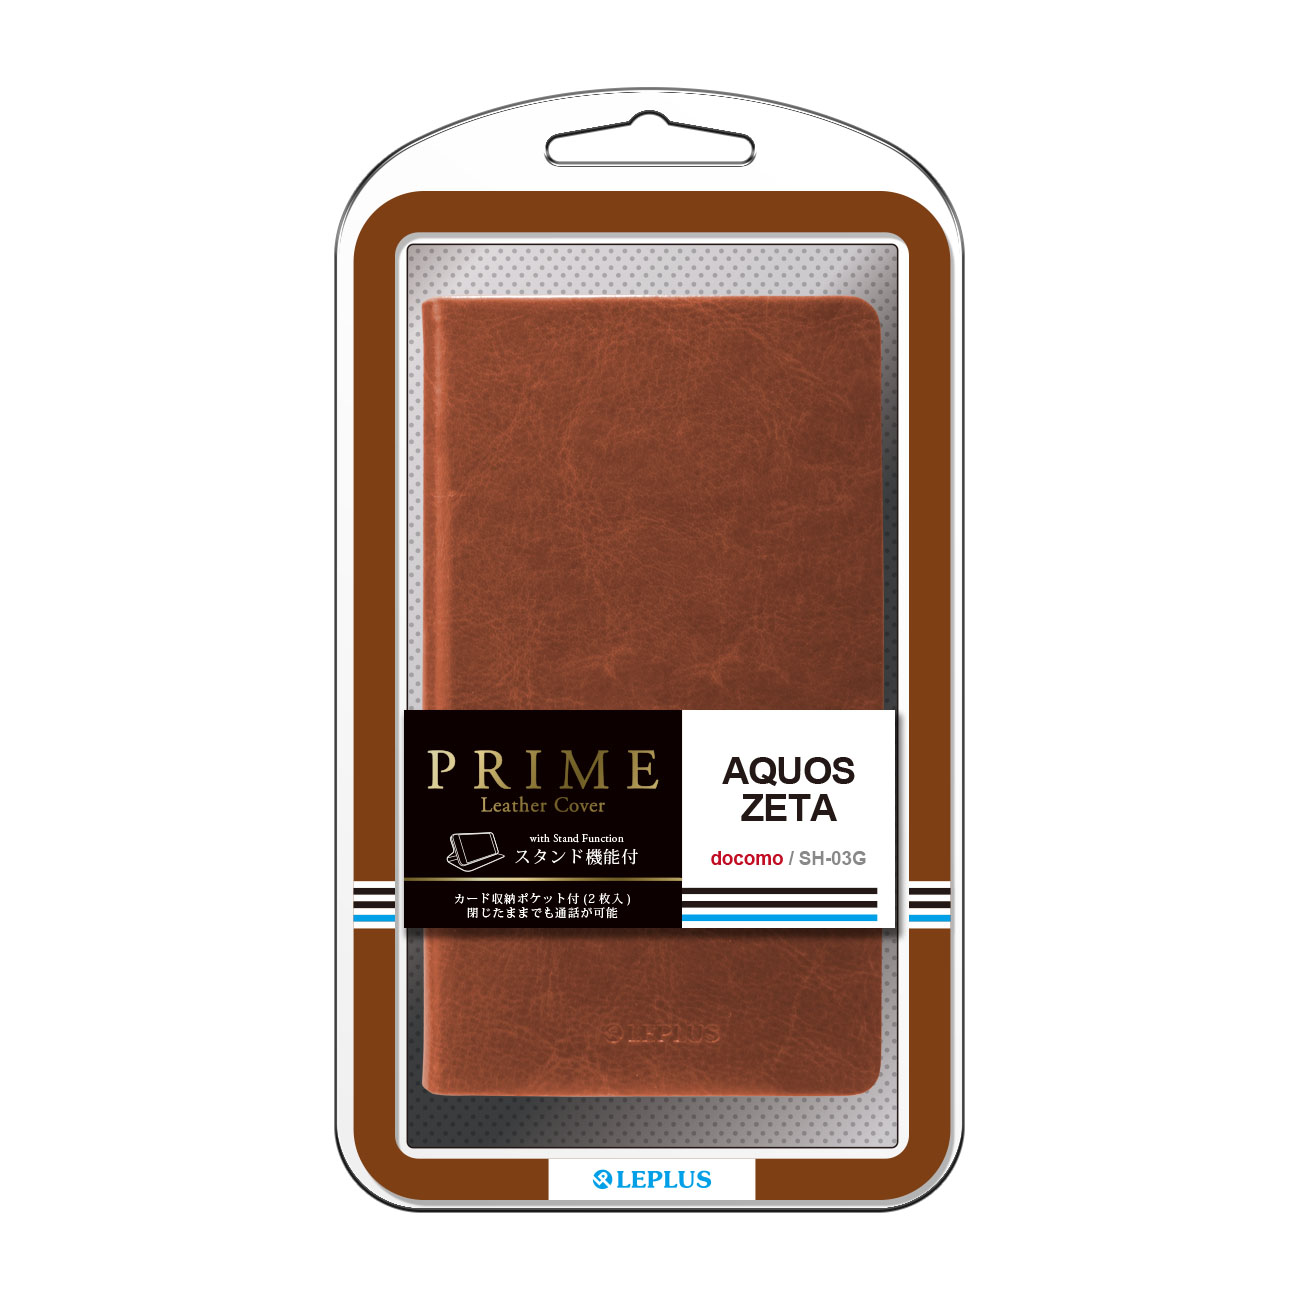 AQUOS ZETA SH-03G ブックタイプPUレザーケース「PRIME」 ブラウン